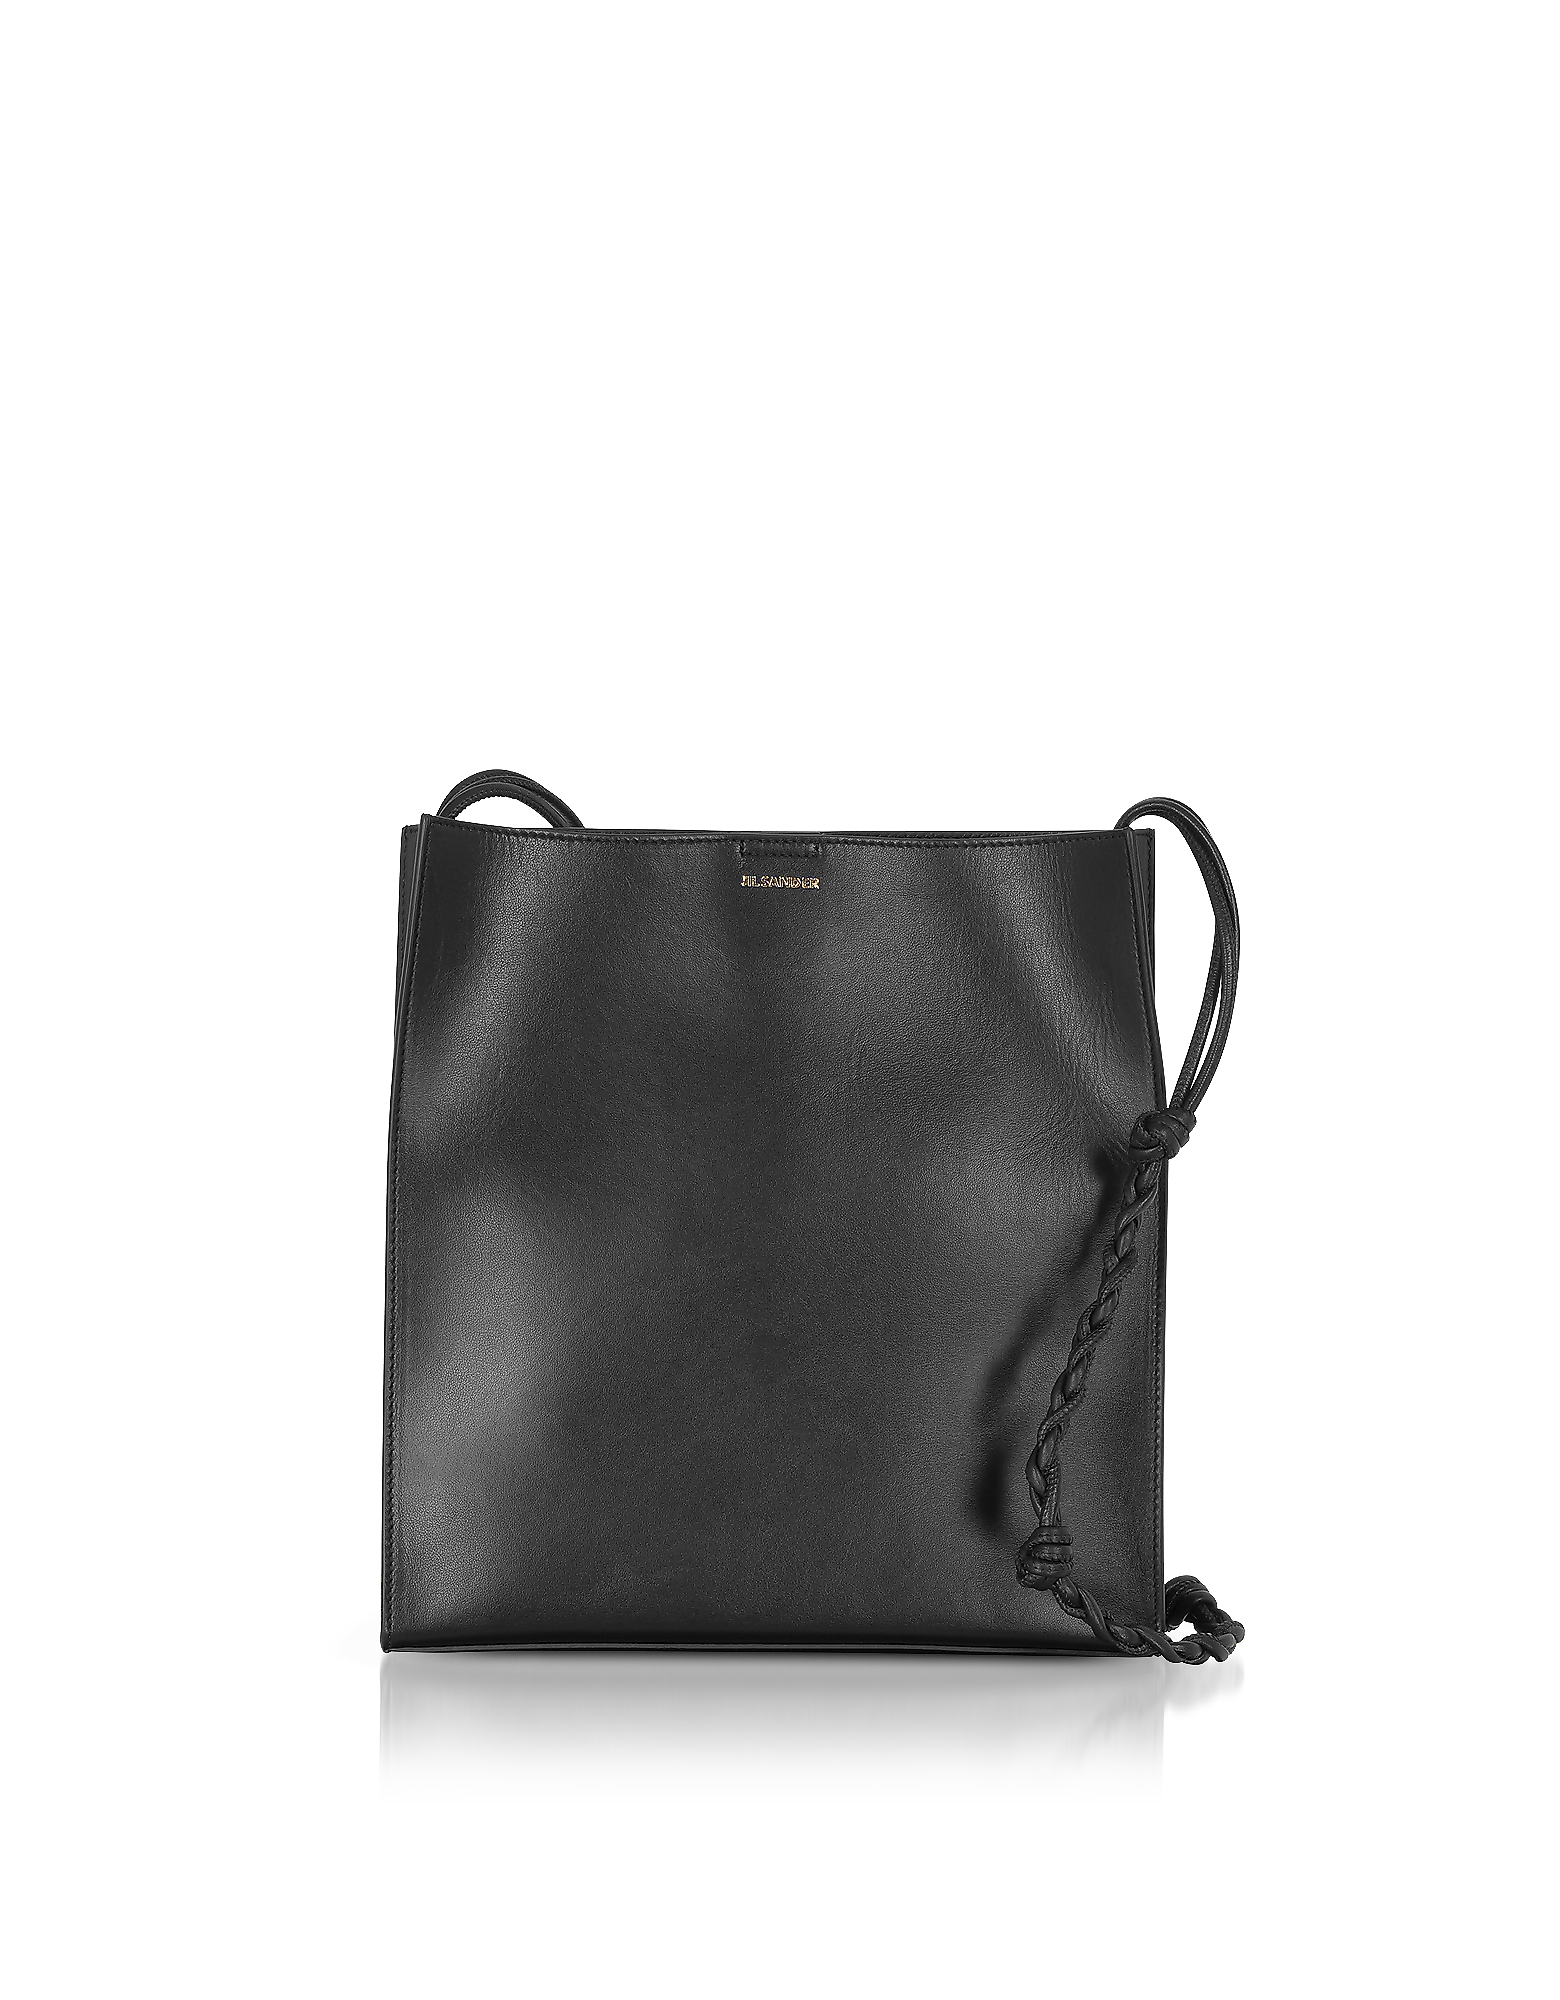 Jil Sander Handbags, Black Leather Tote Bag